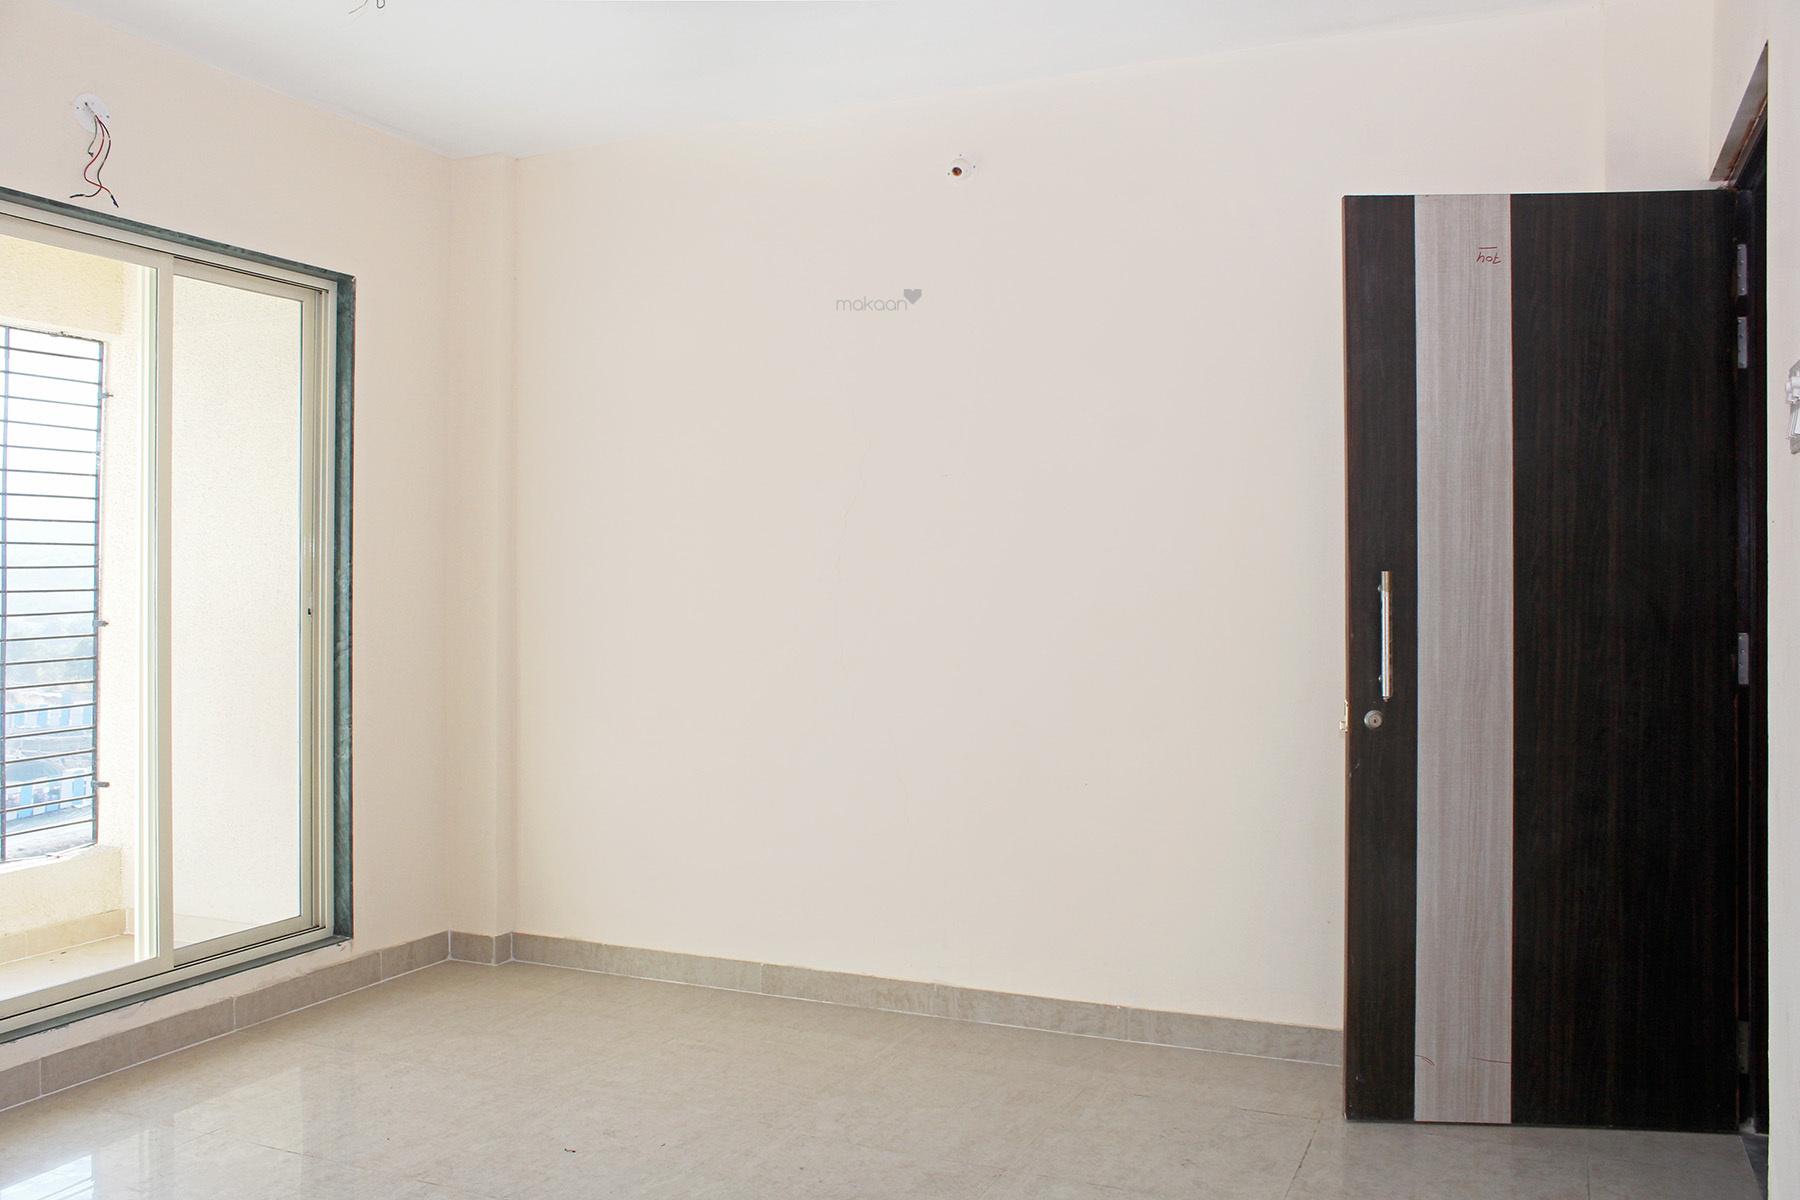 1045 sq ft 2BHK 2BHK+2T (1,045 sq ft) Property By Proptiger In Highlands, Badlapur East